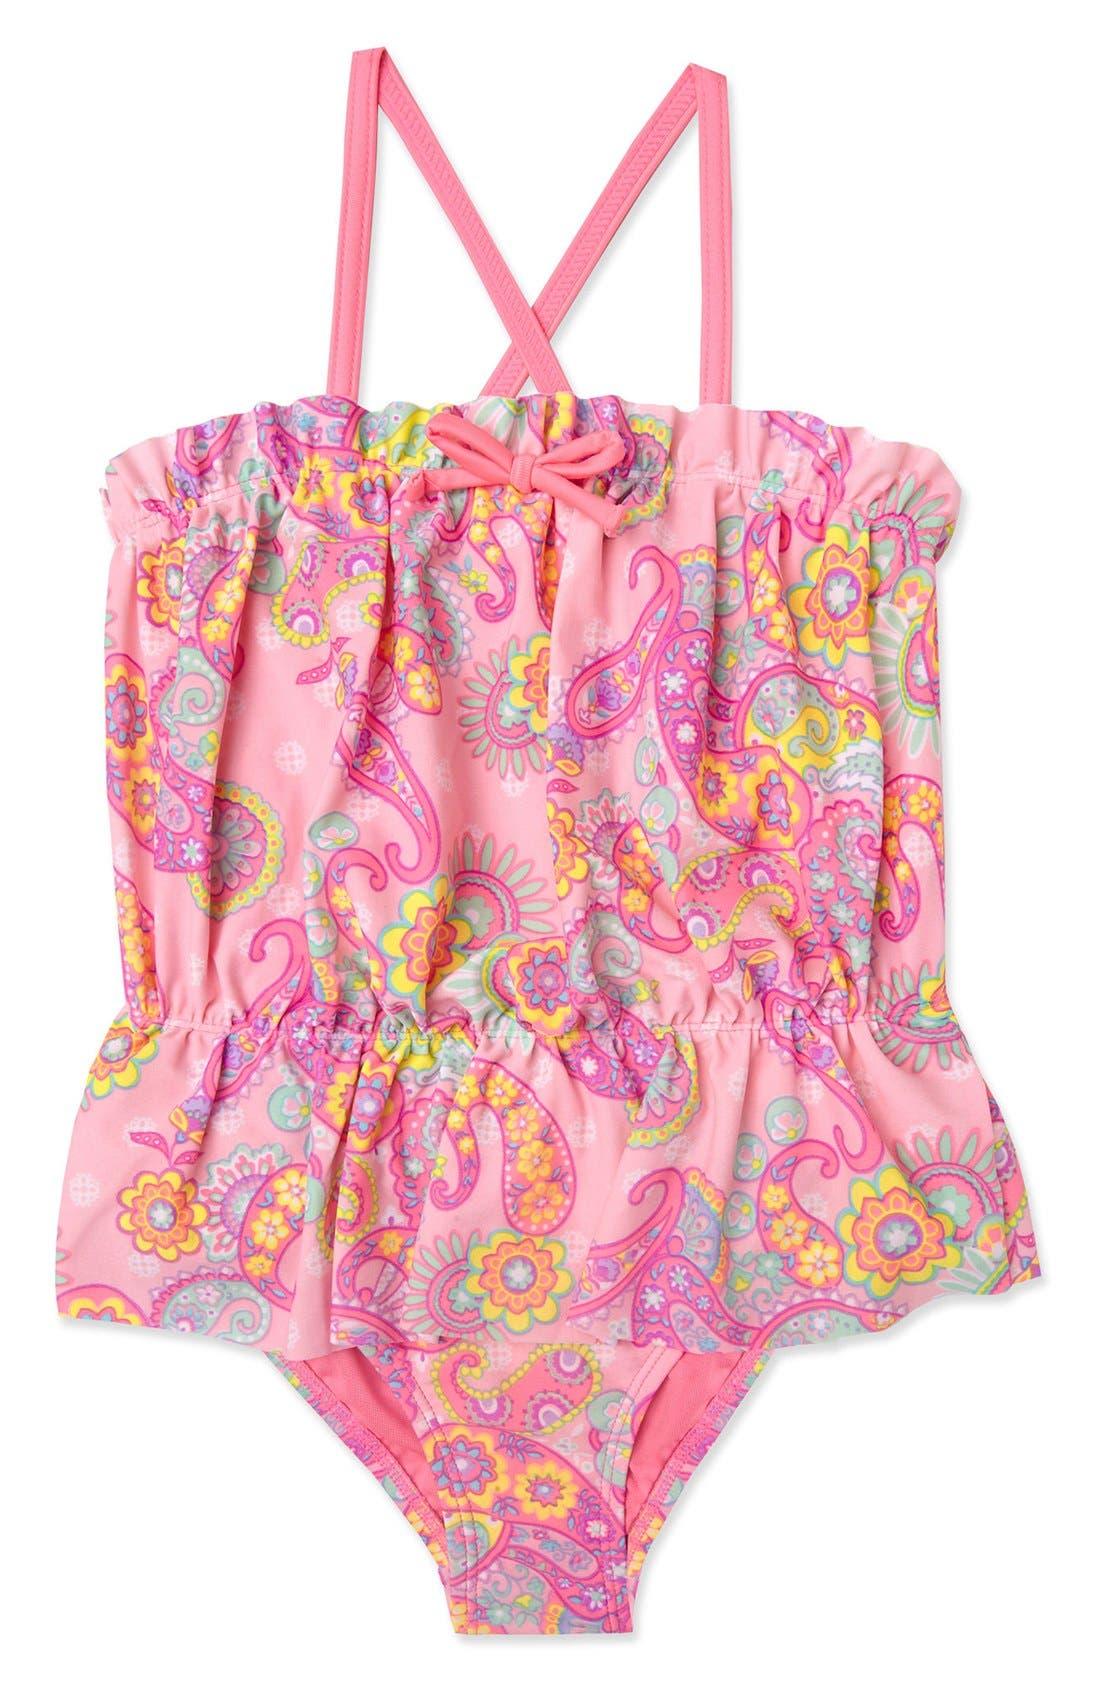 Hula Star 'Enchanted Paisley' One-Piece Swimsuit (Toddler Girls & Little Girls)